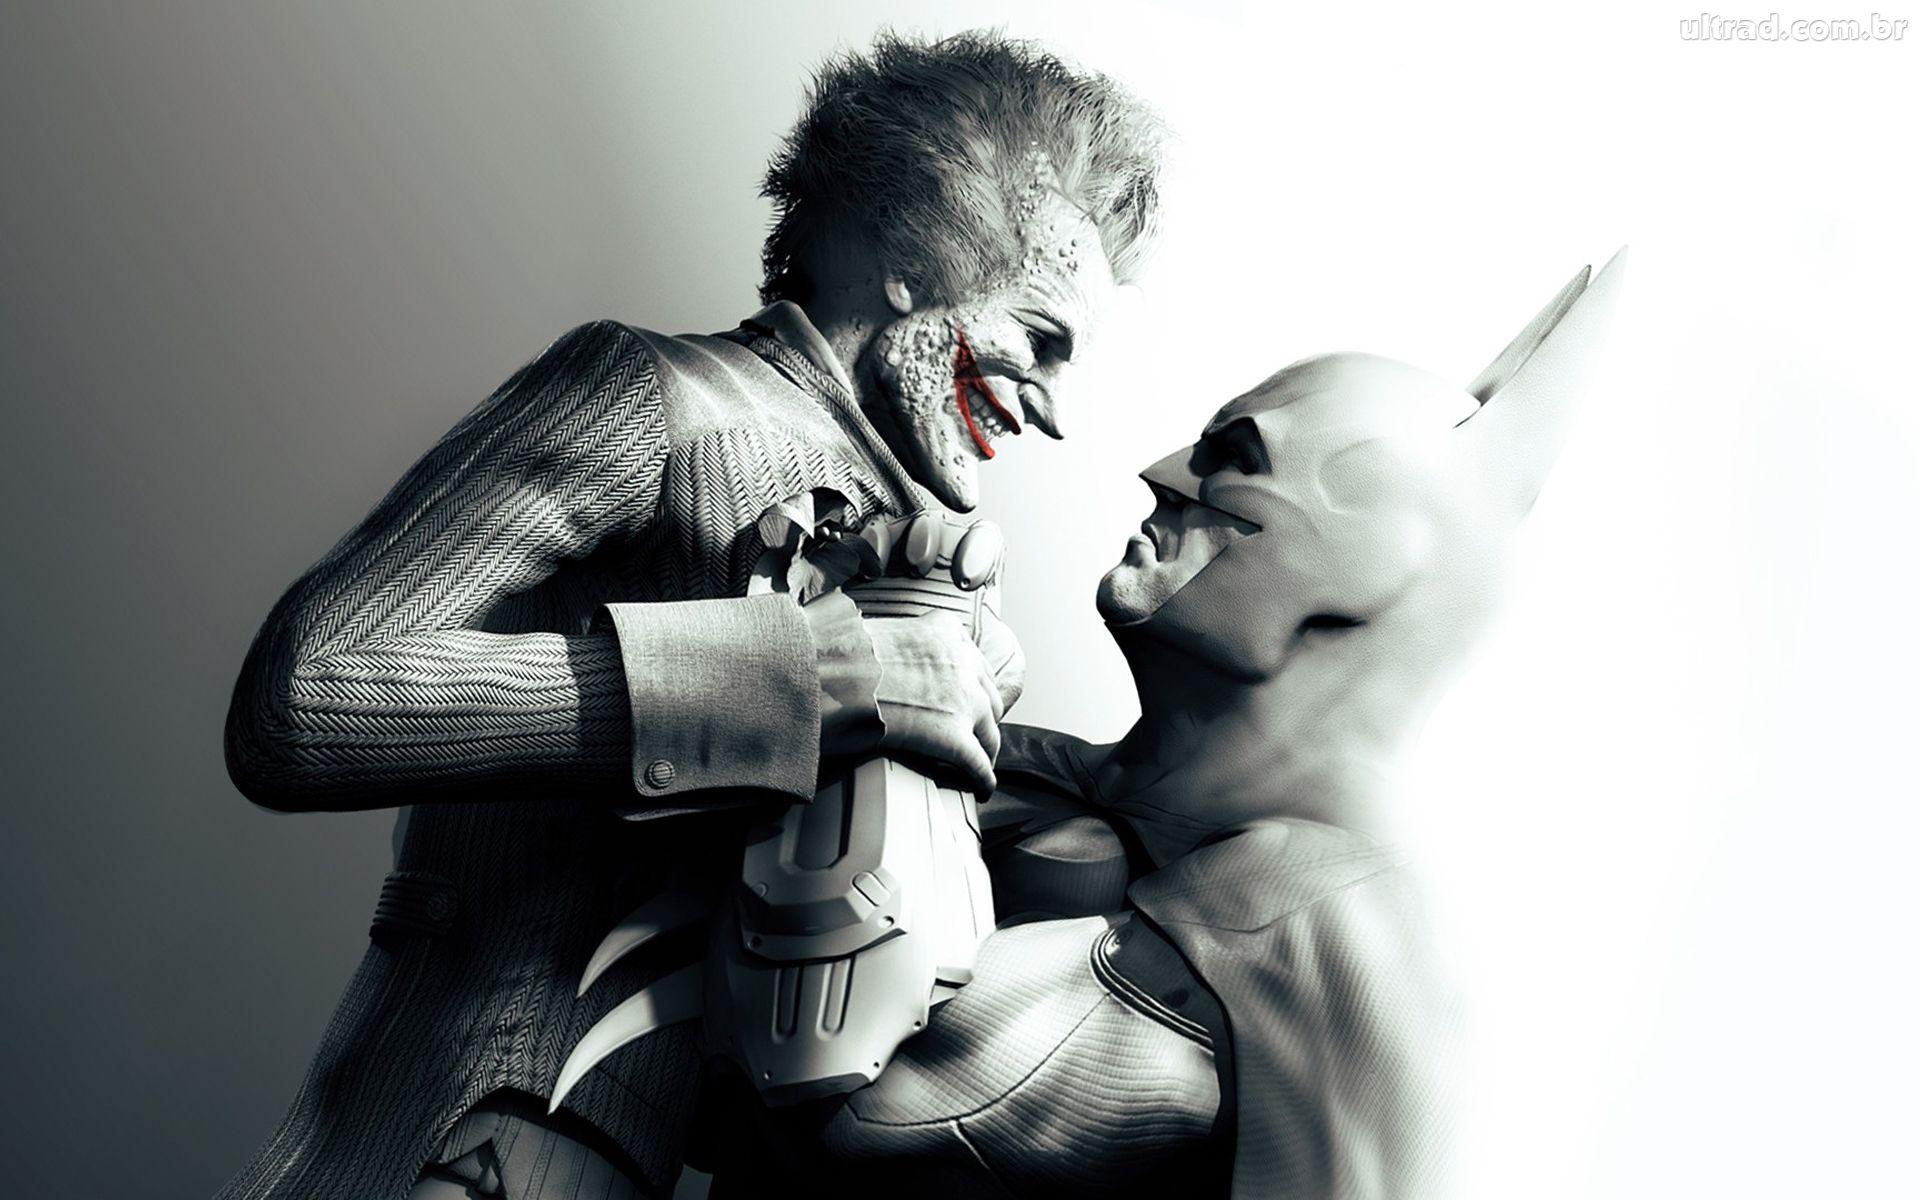 Бэтмен герои комиксов Джокер  № 3922424 бесплатно